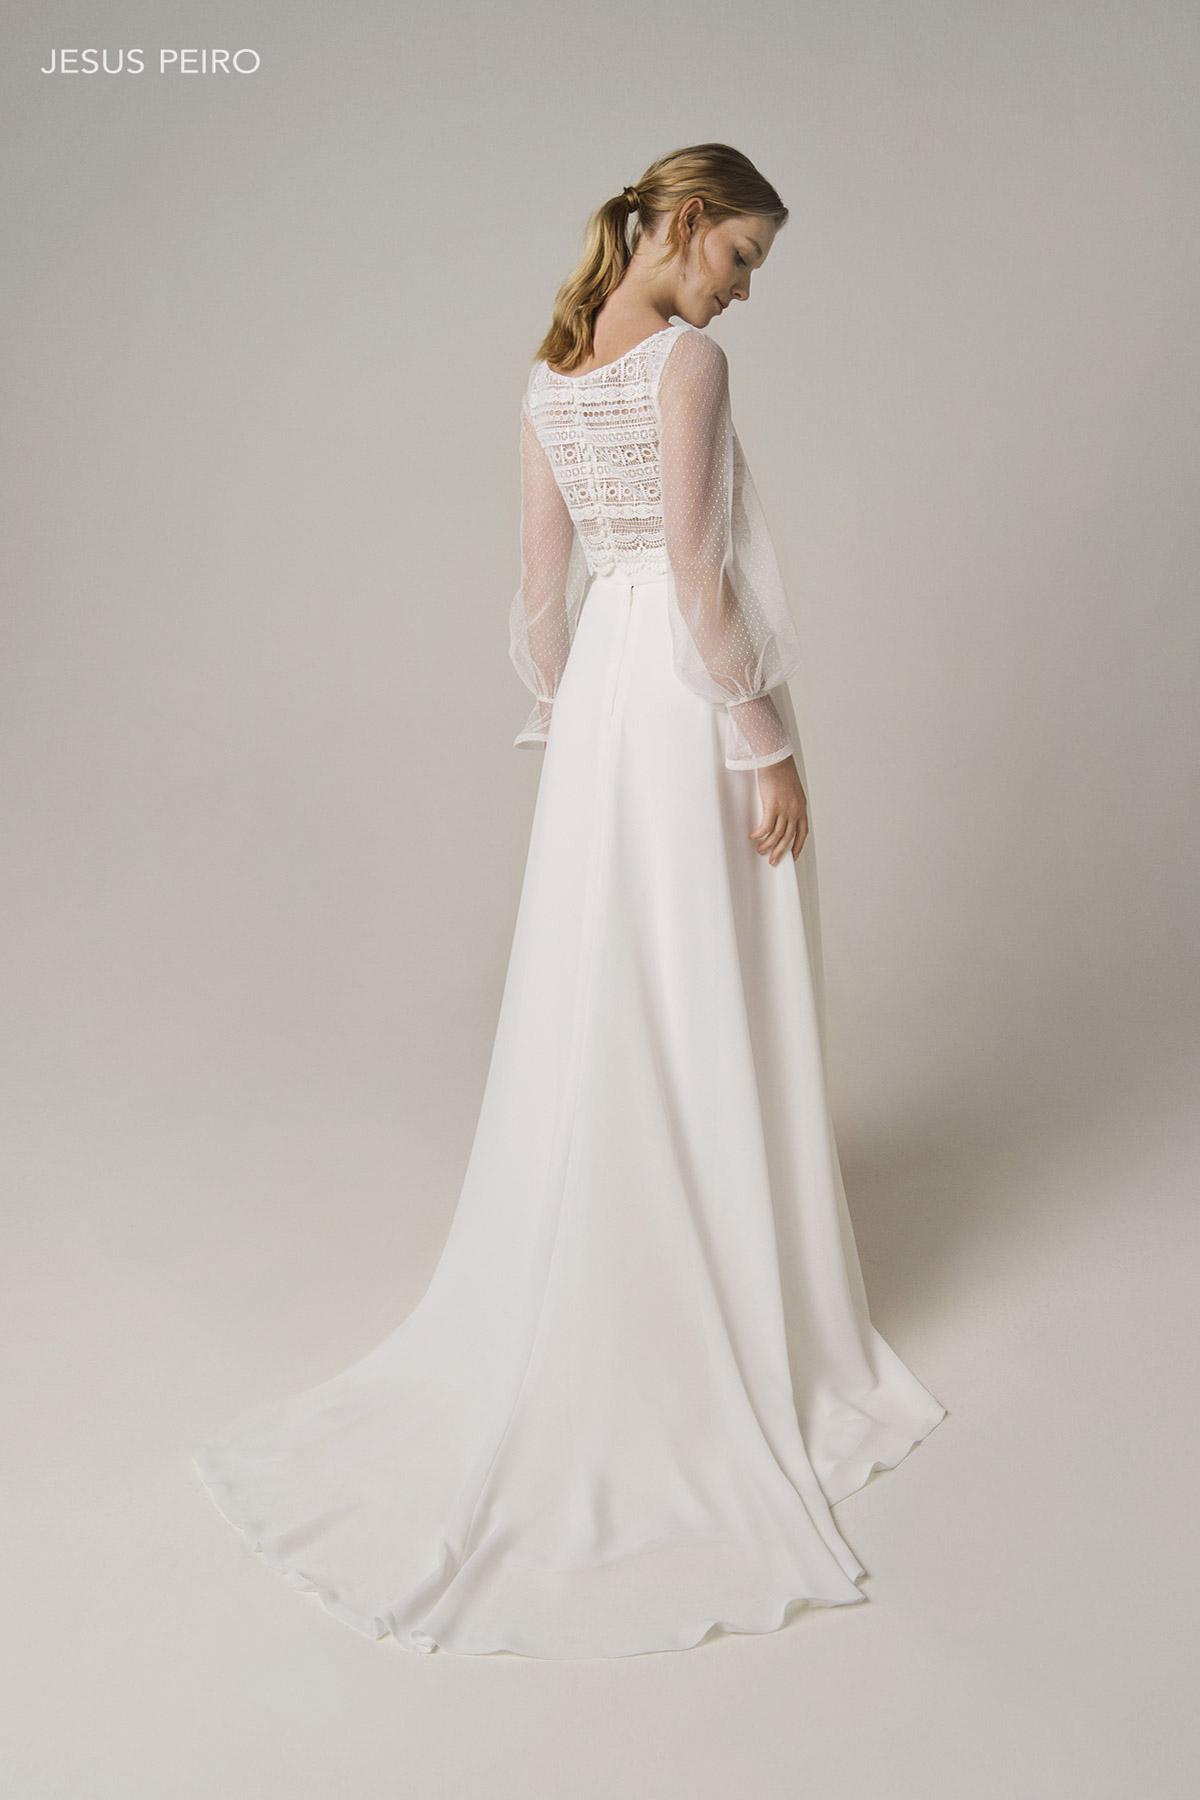 Vestido novia Jesús Peiró Ref.238